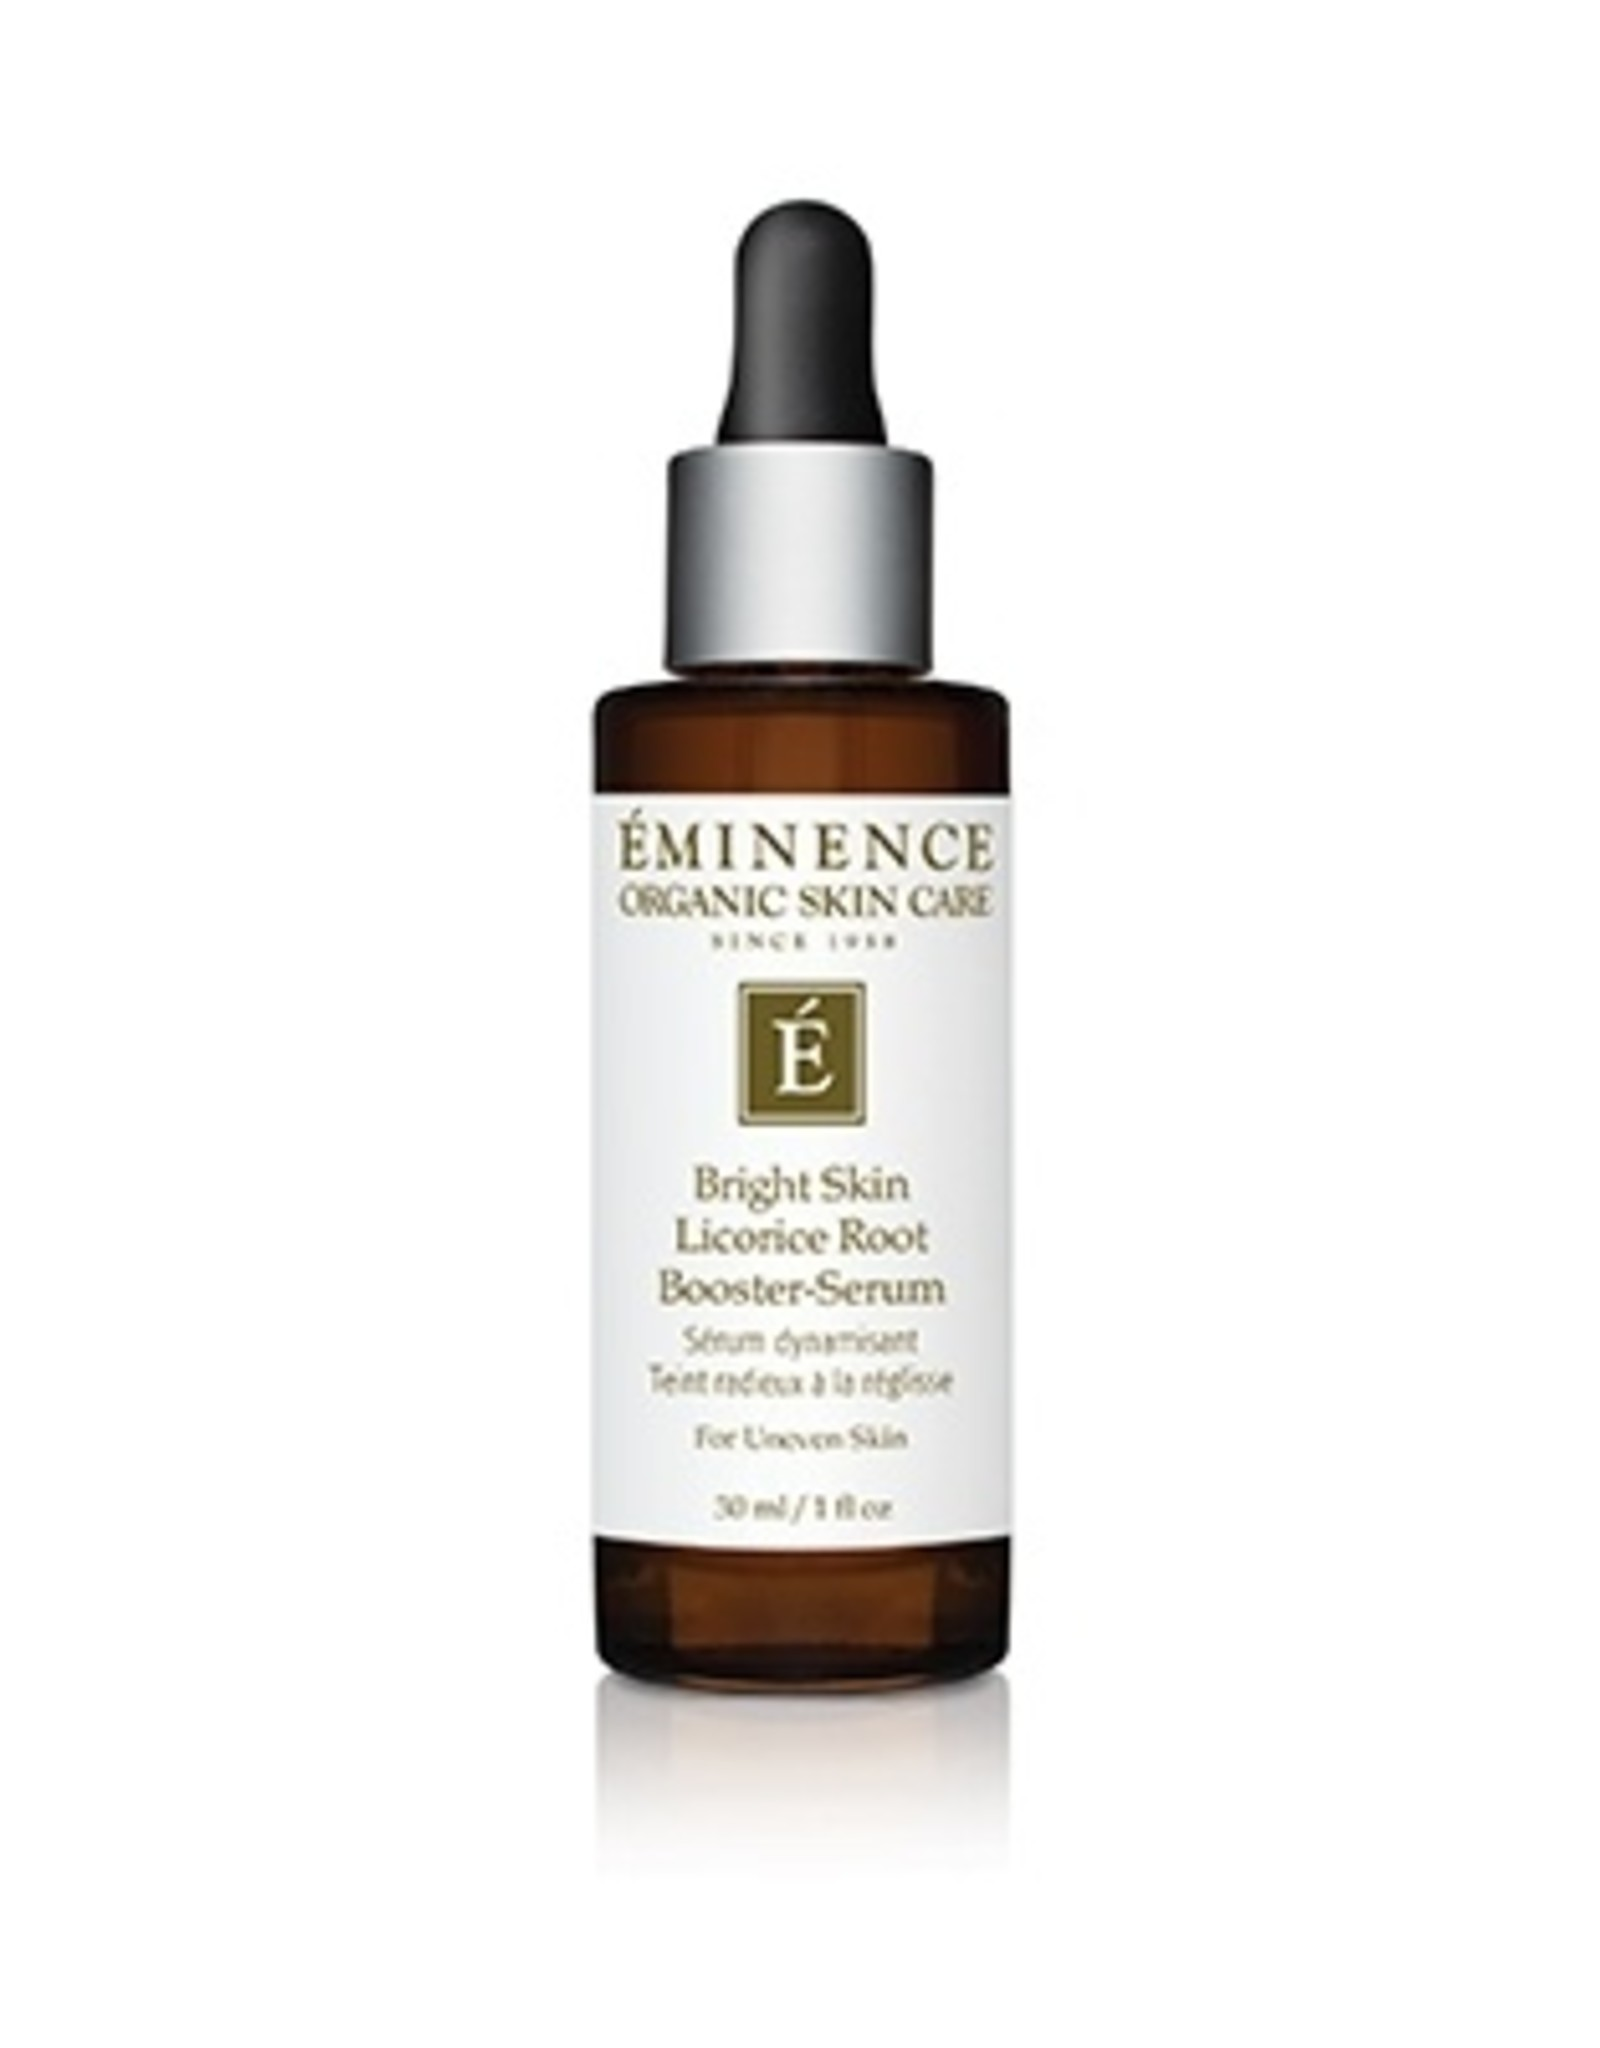 Eminence Organic Skin Care Bright Skin Licorice Root Booster-Serum